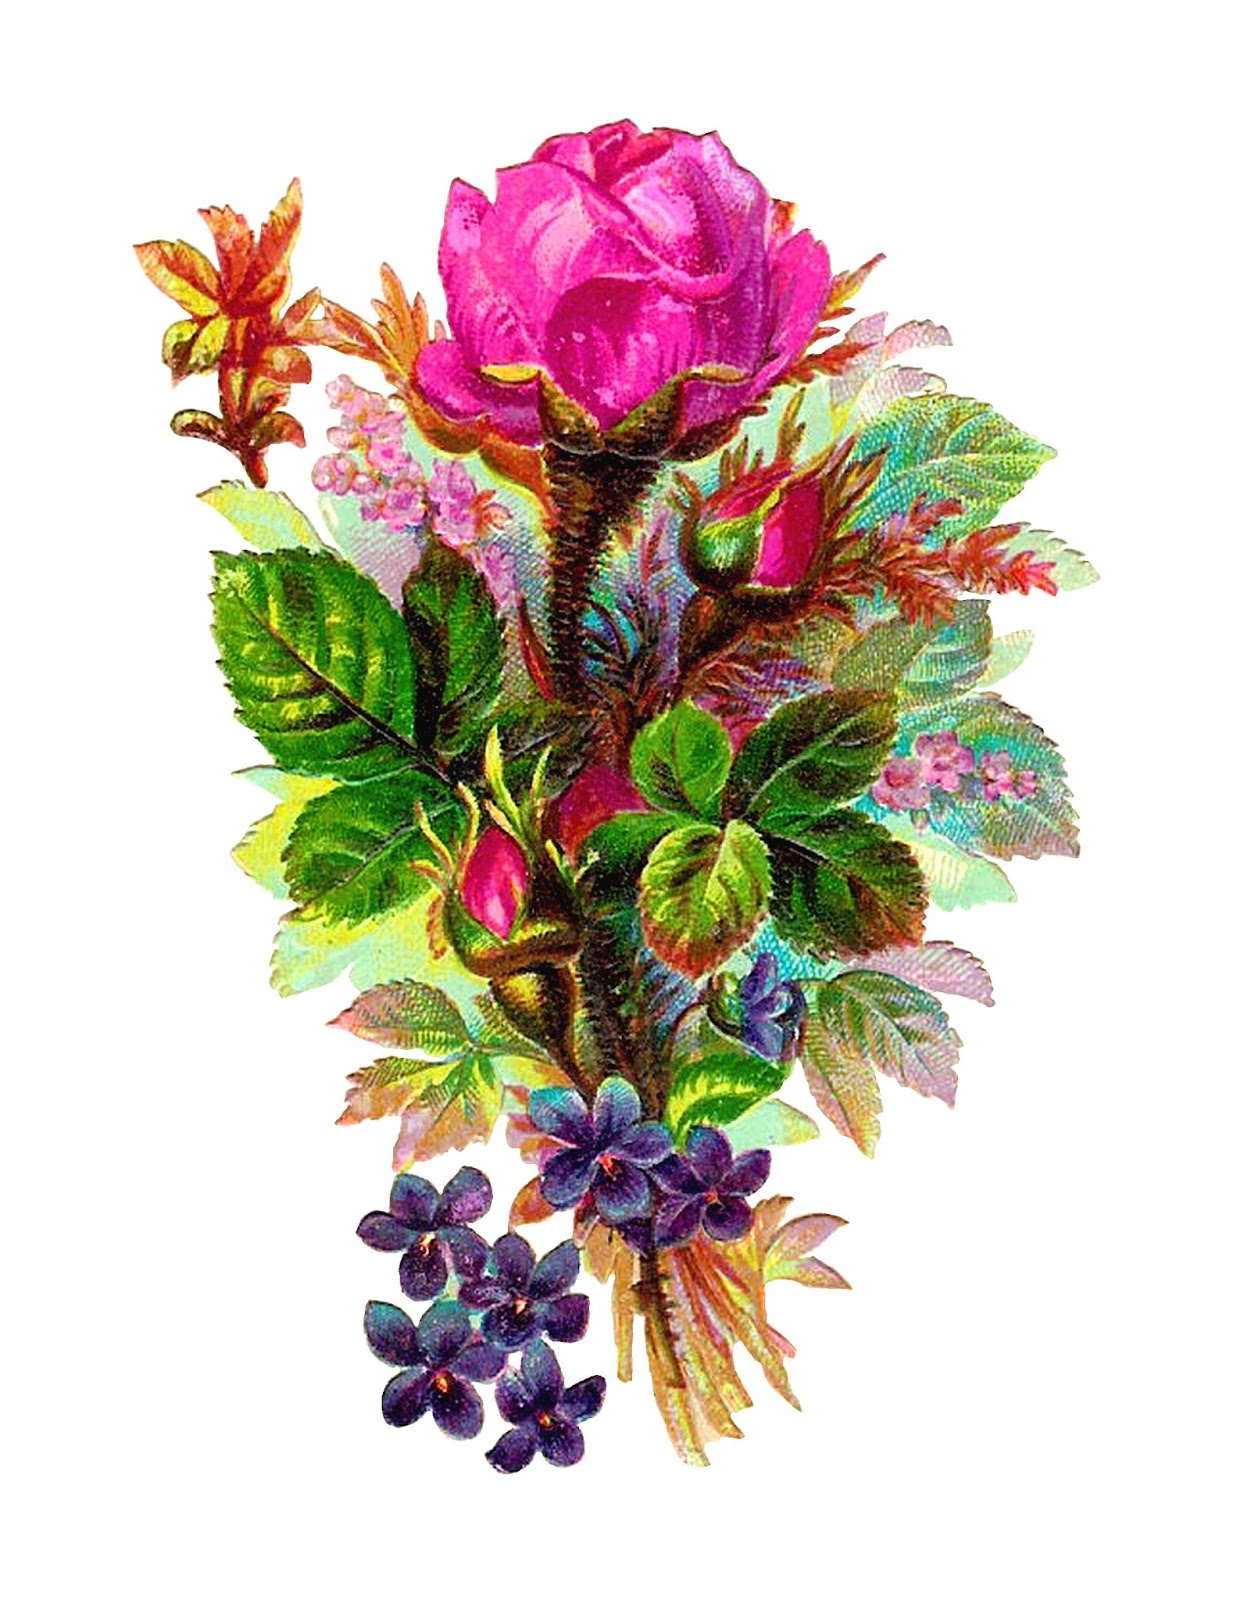 rose flowers digital design - photo #27